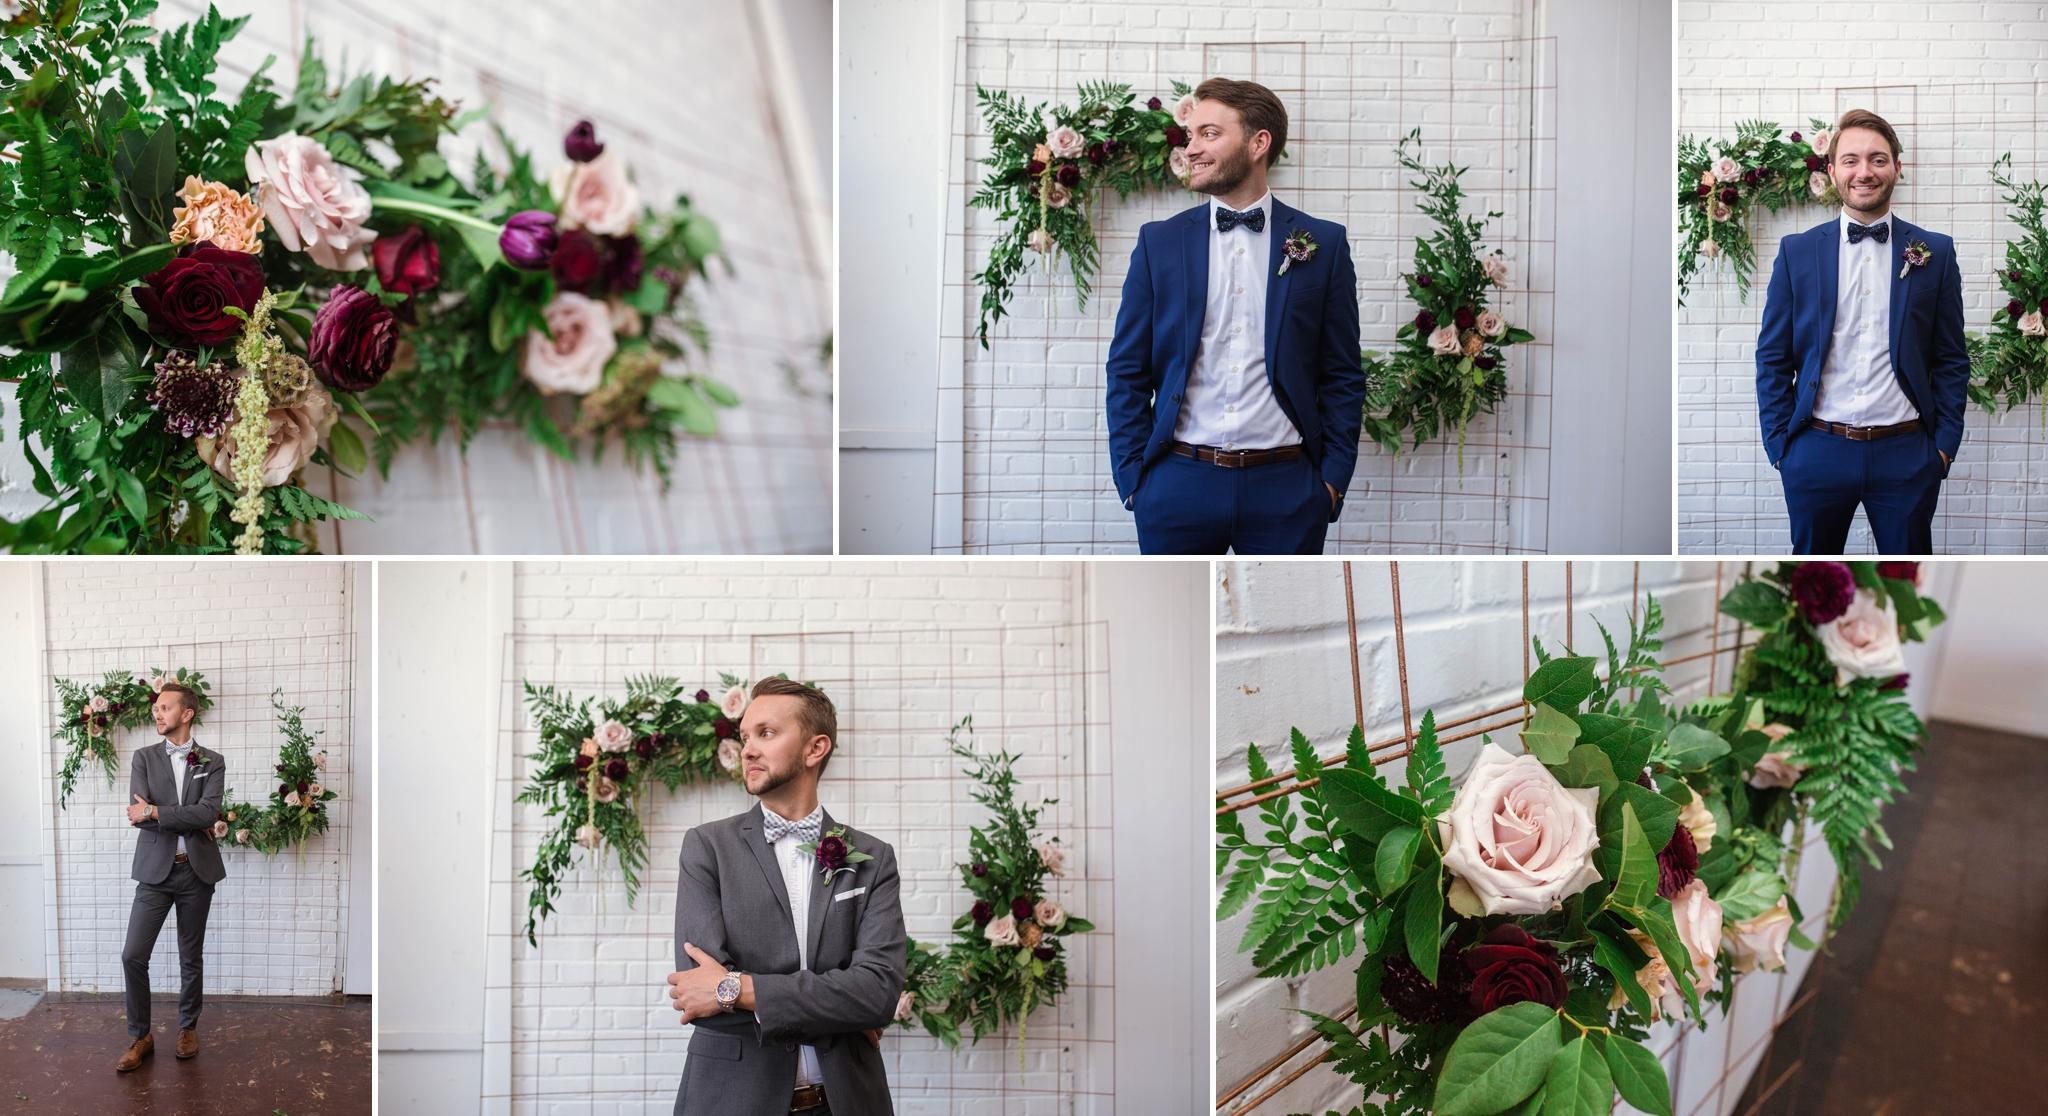 Gay and Lesbian friendly Wedding Photographer in Raleigh North Carolina - Johanna Dye Photography 14.jpg